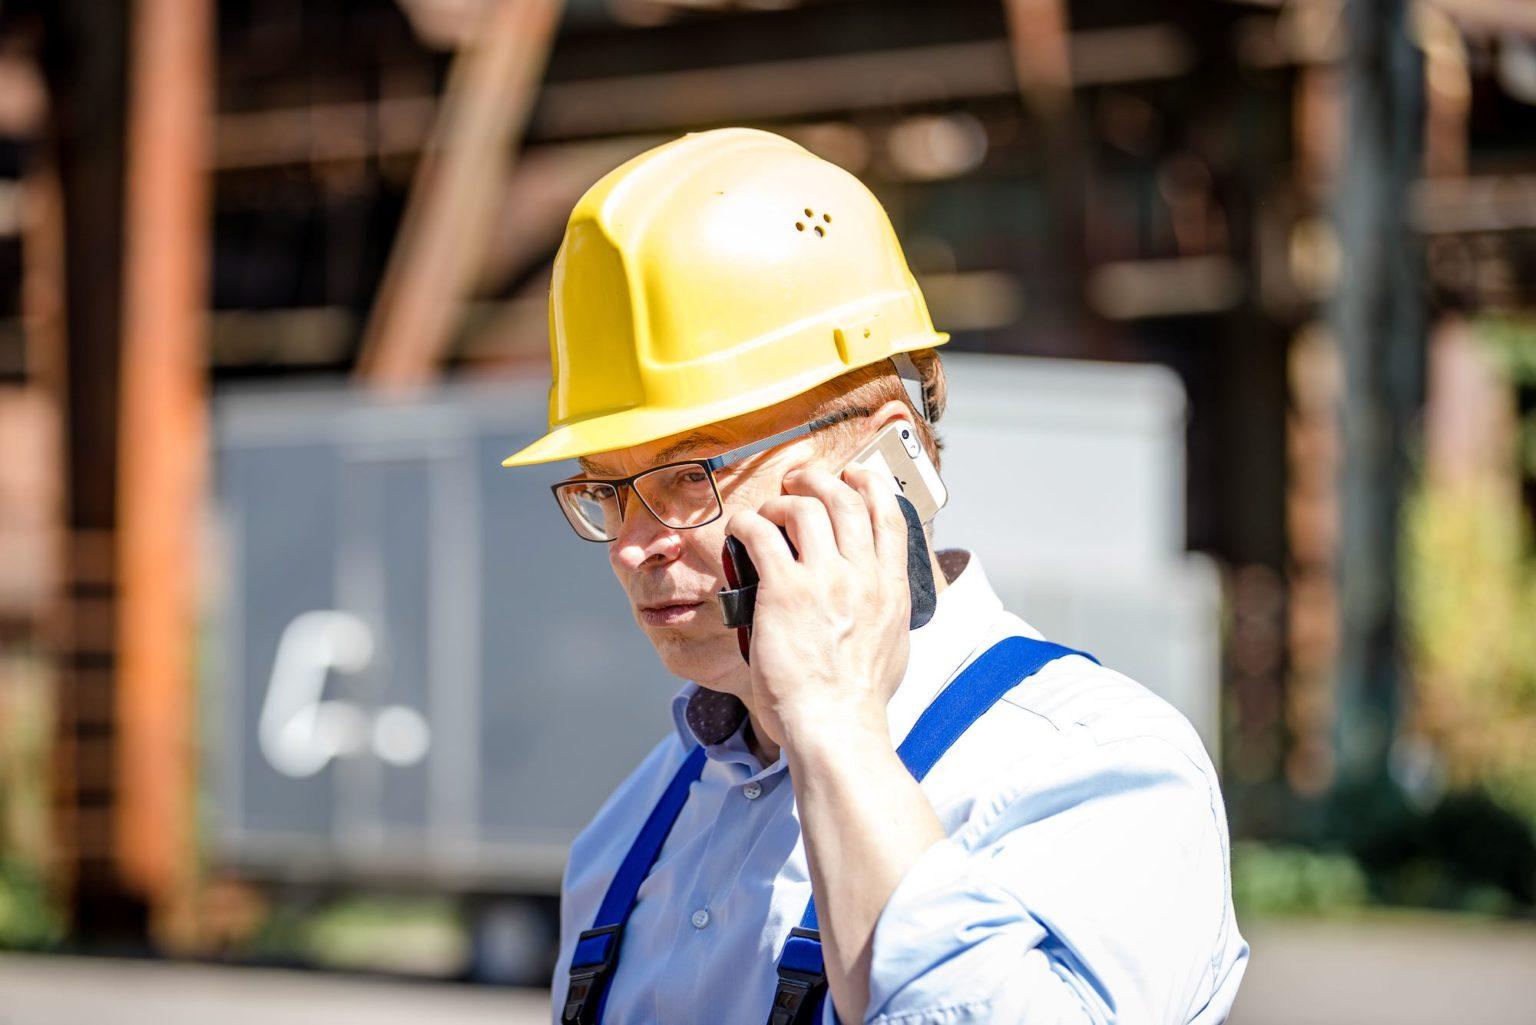 Wolfgang Schmid am Handy im Stahlwerk